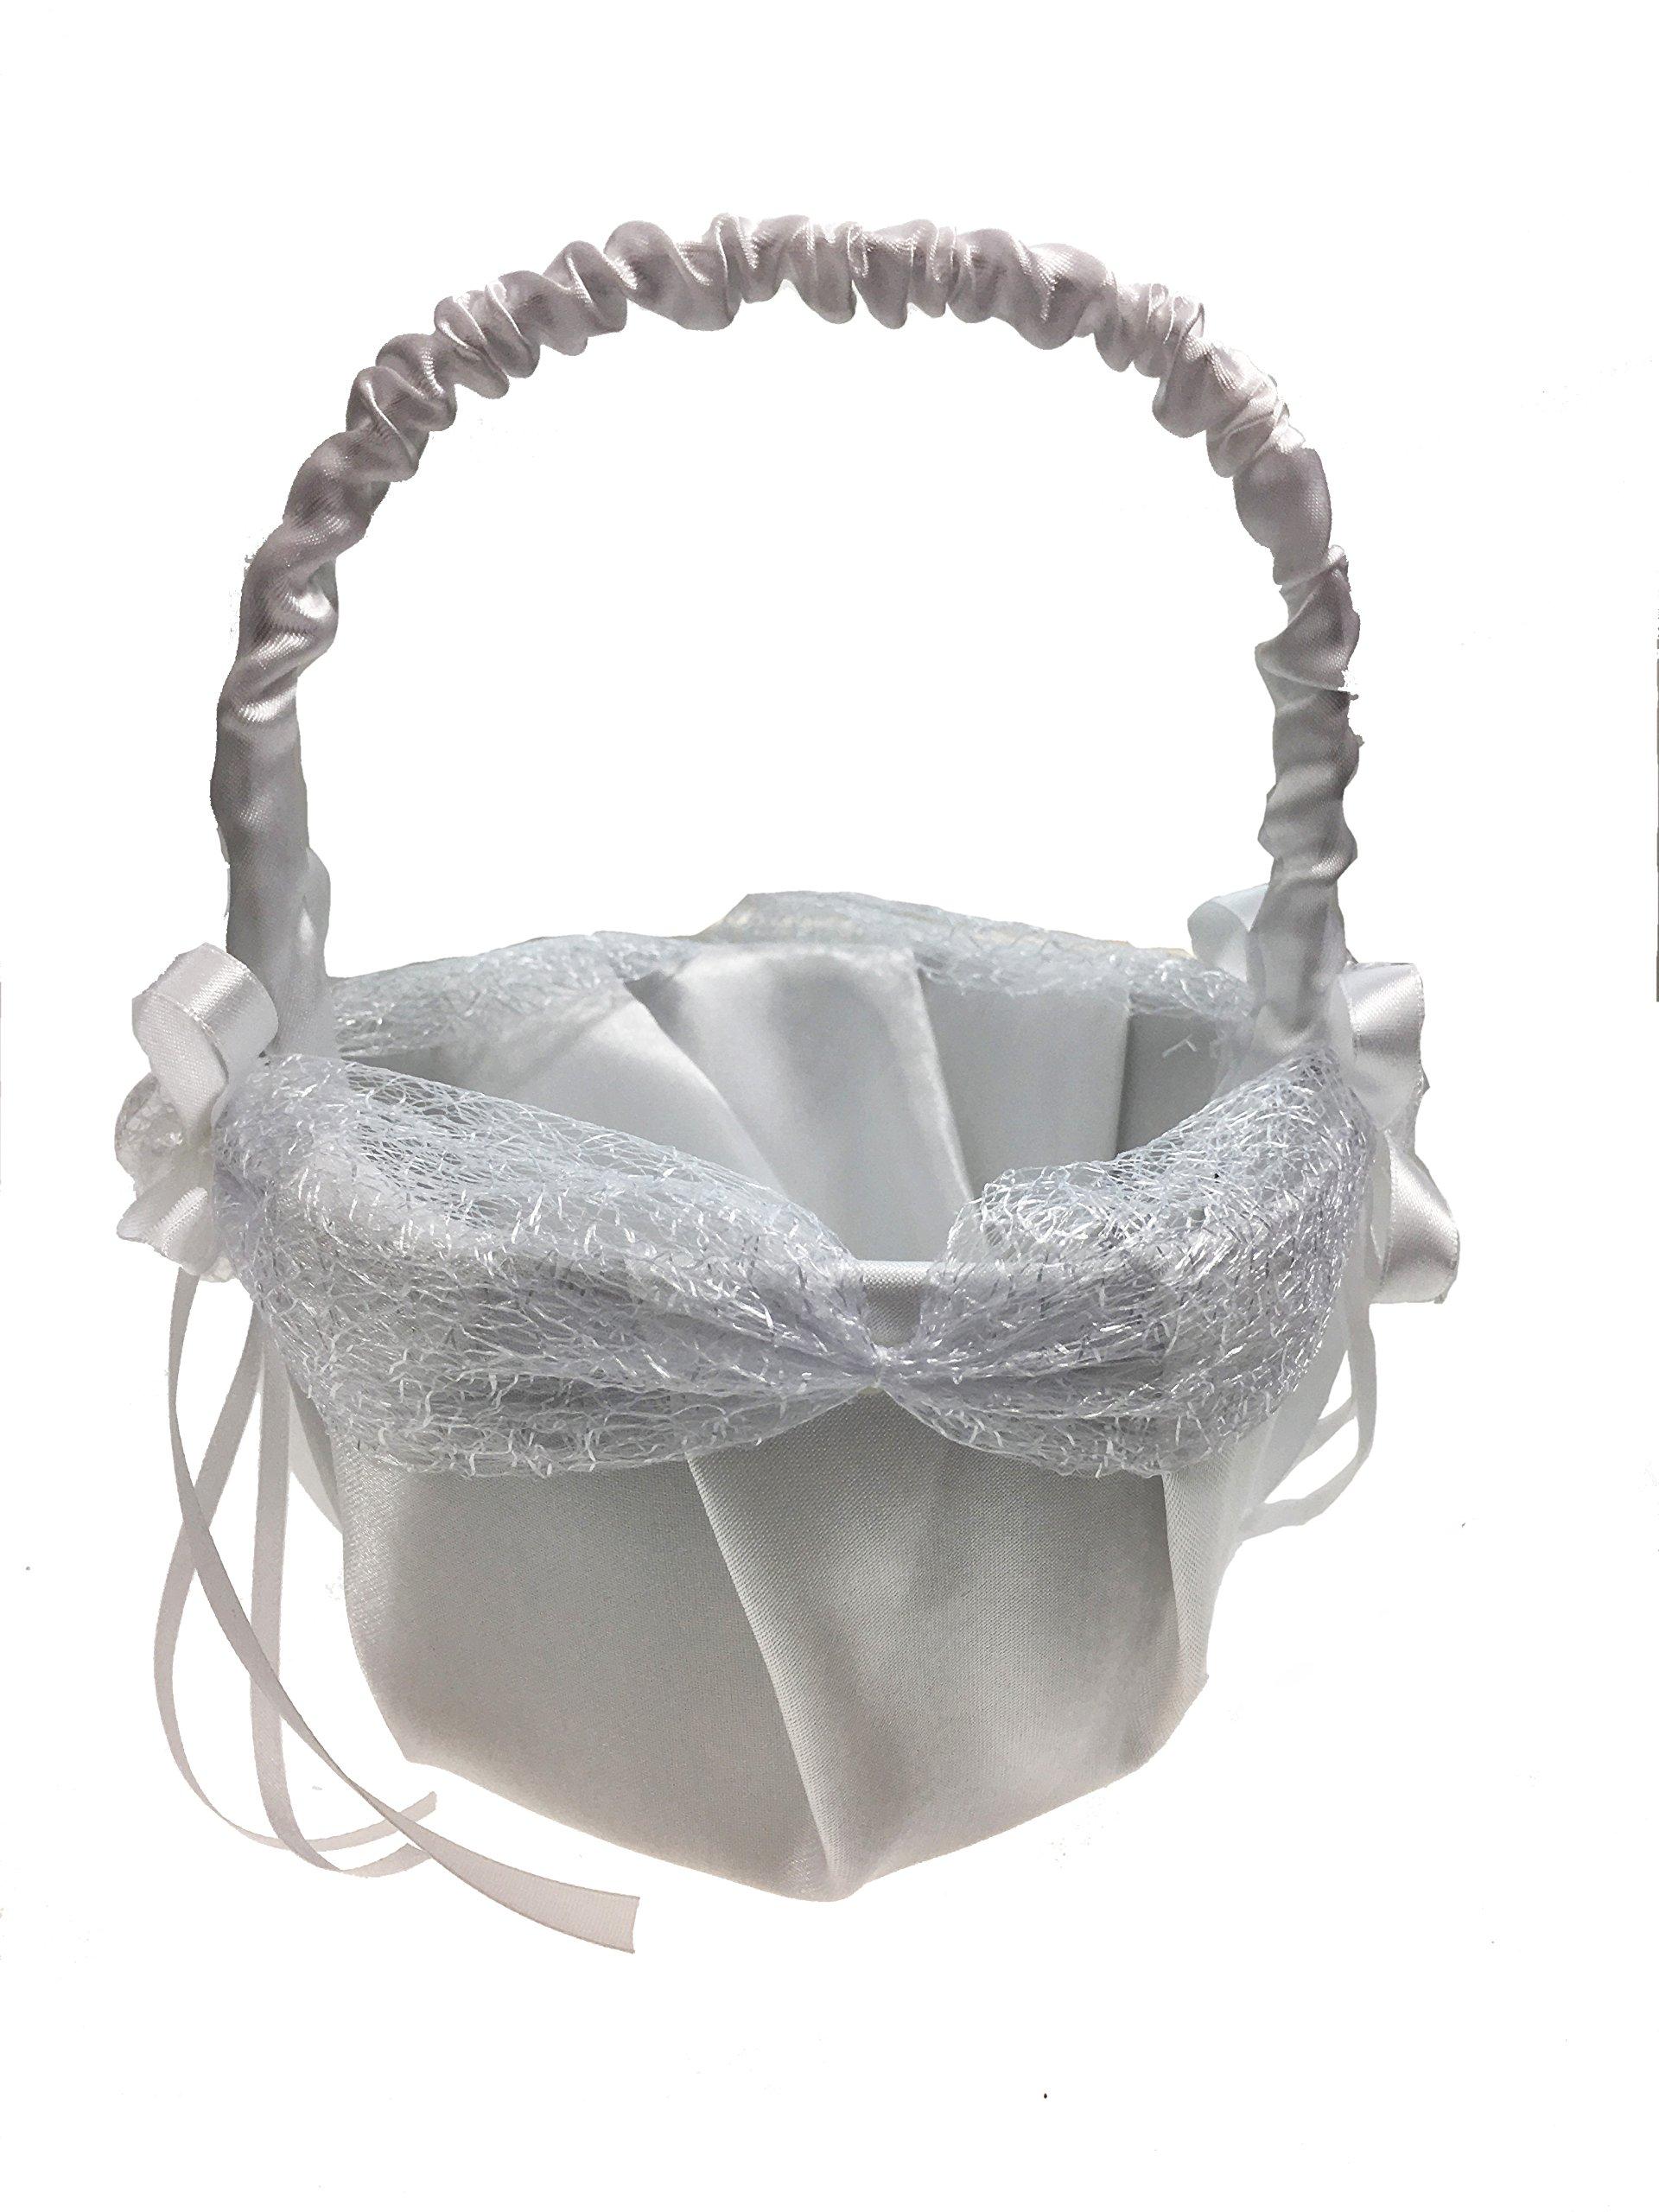 8.5'' Inch White Satin Wedding Basket with Petals & Rhinestones - For Flower Girl, Flowers, Roses, Petals, Anniversaries, & Weddings (Basket 2, Purple Petals)